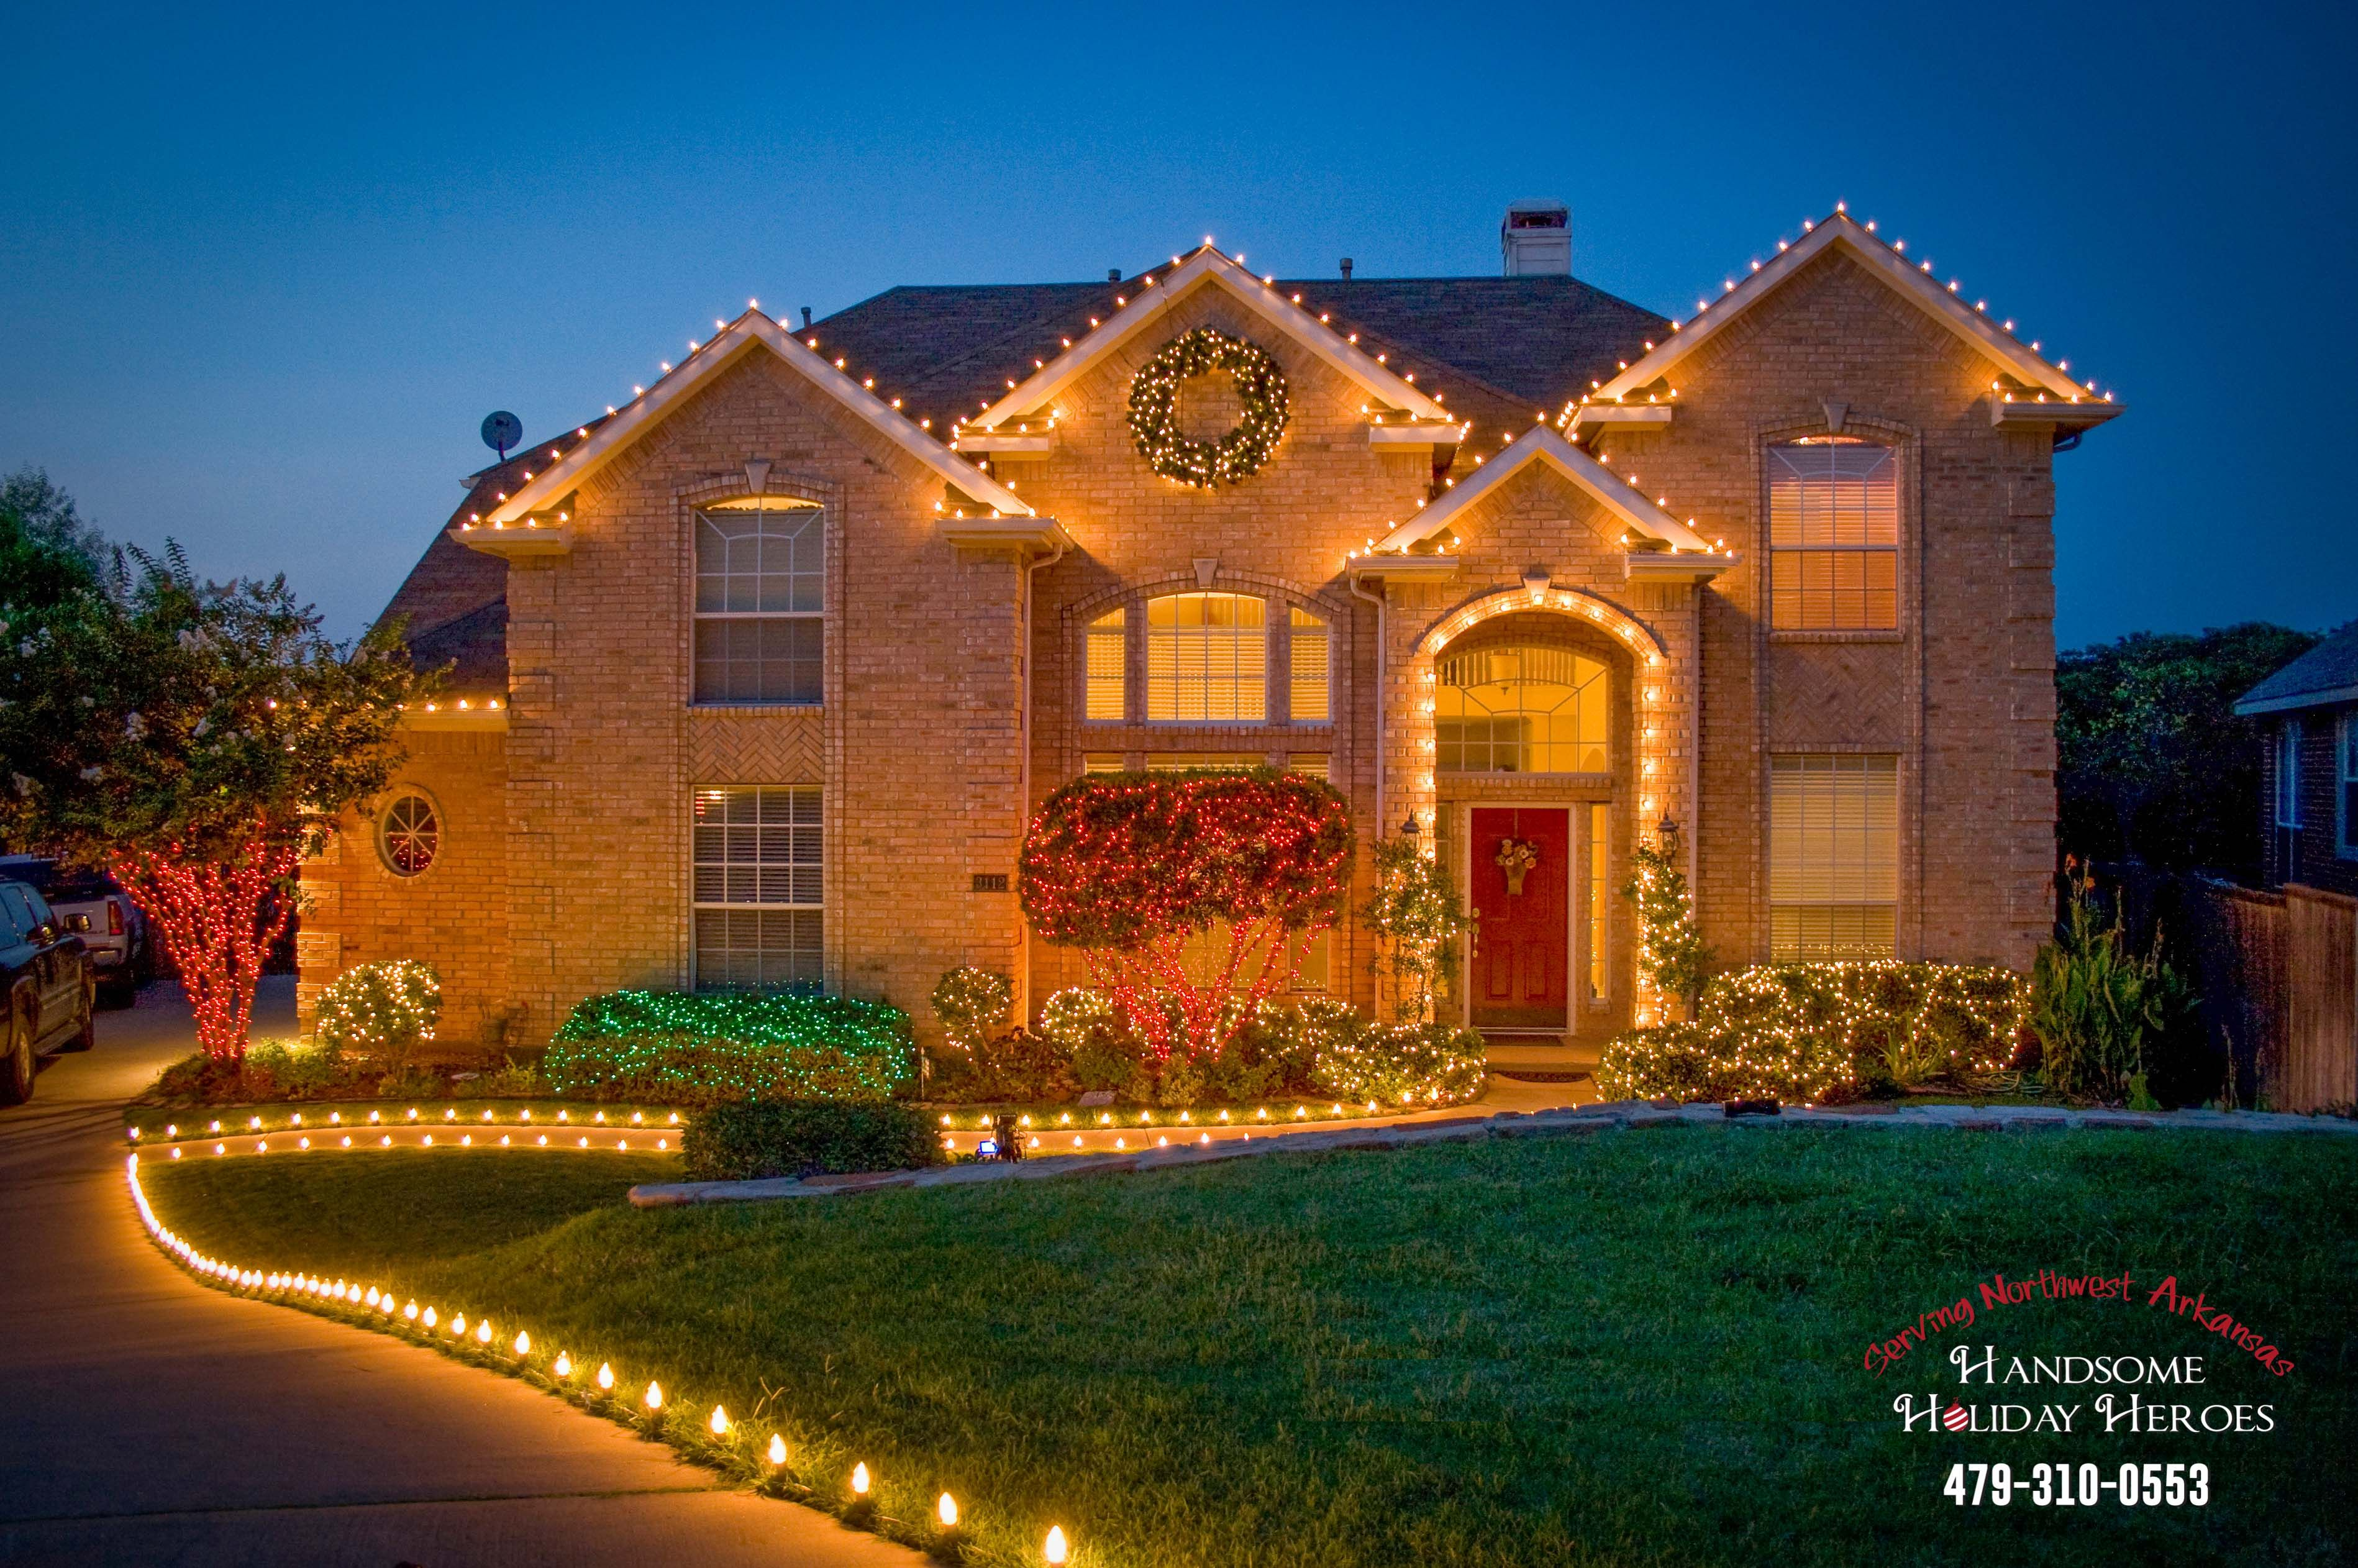 Fayetteville Christmas Light Installation Professional Christmas Lights Christmas Light Installation Outdoor Christmas Lights